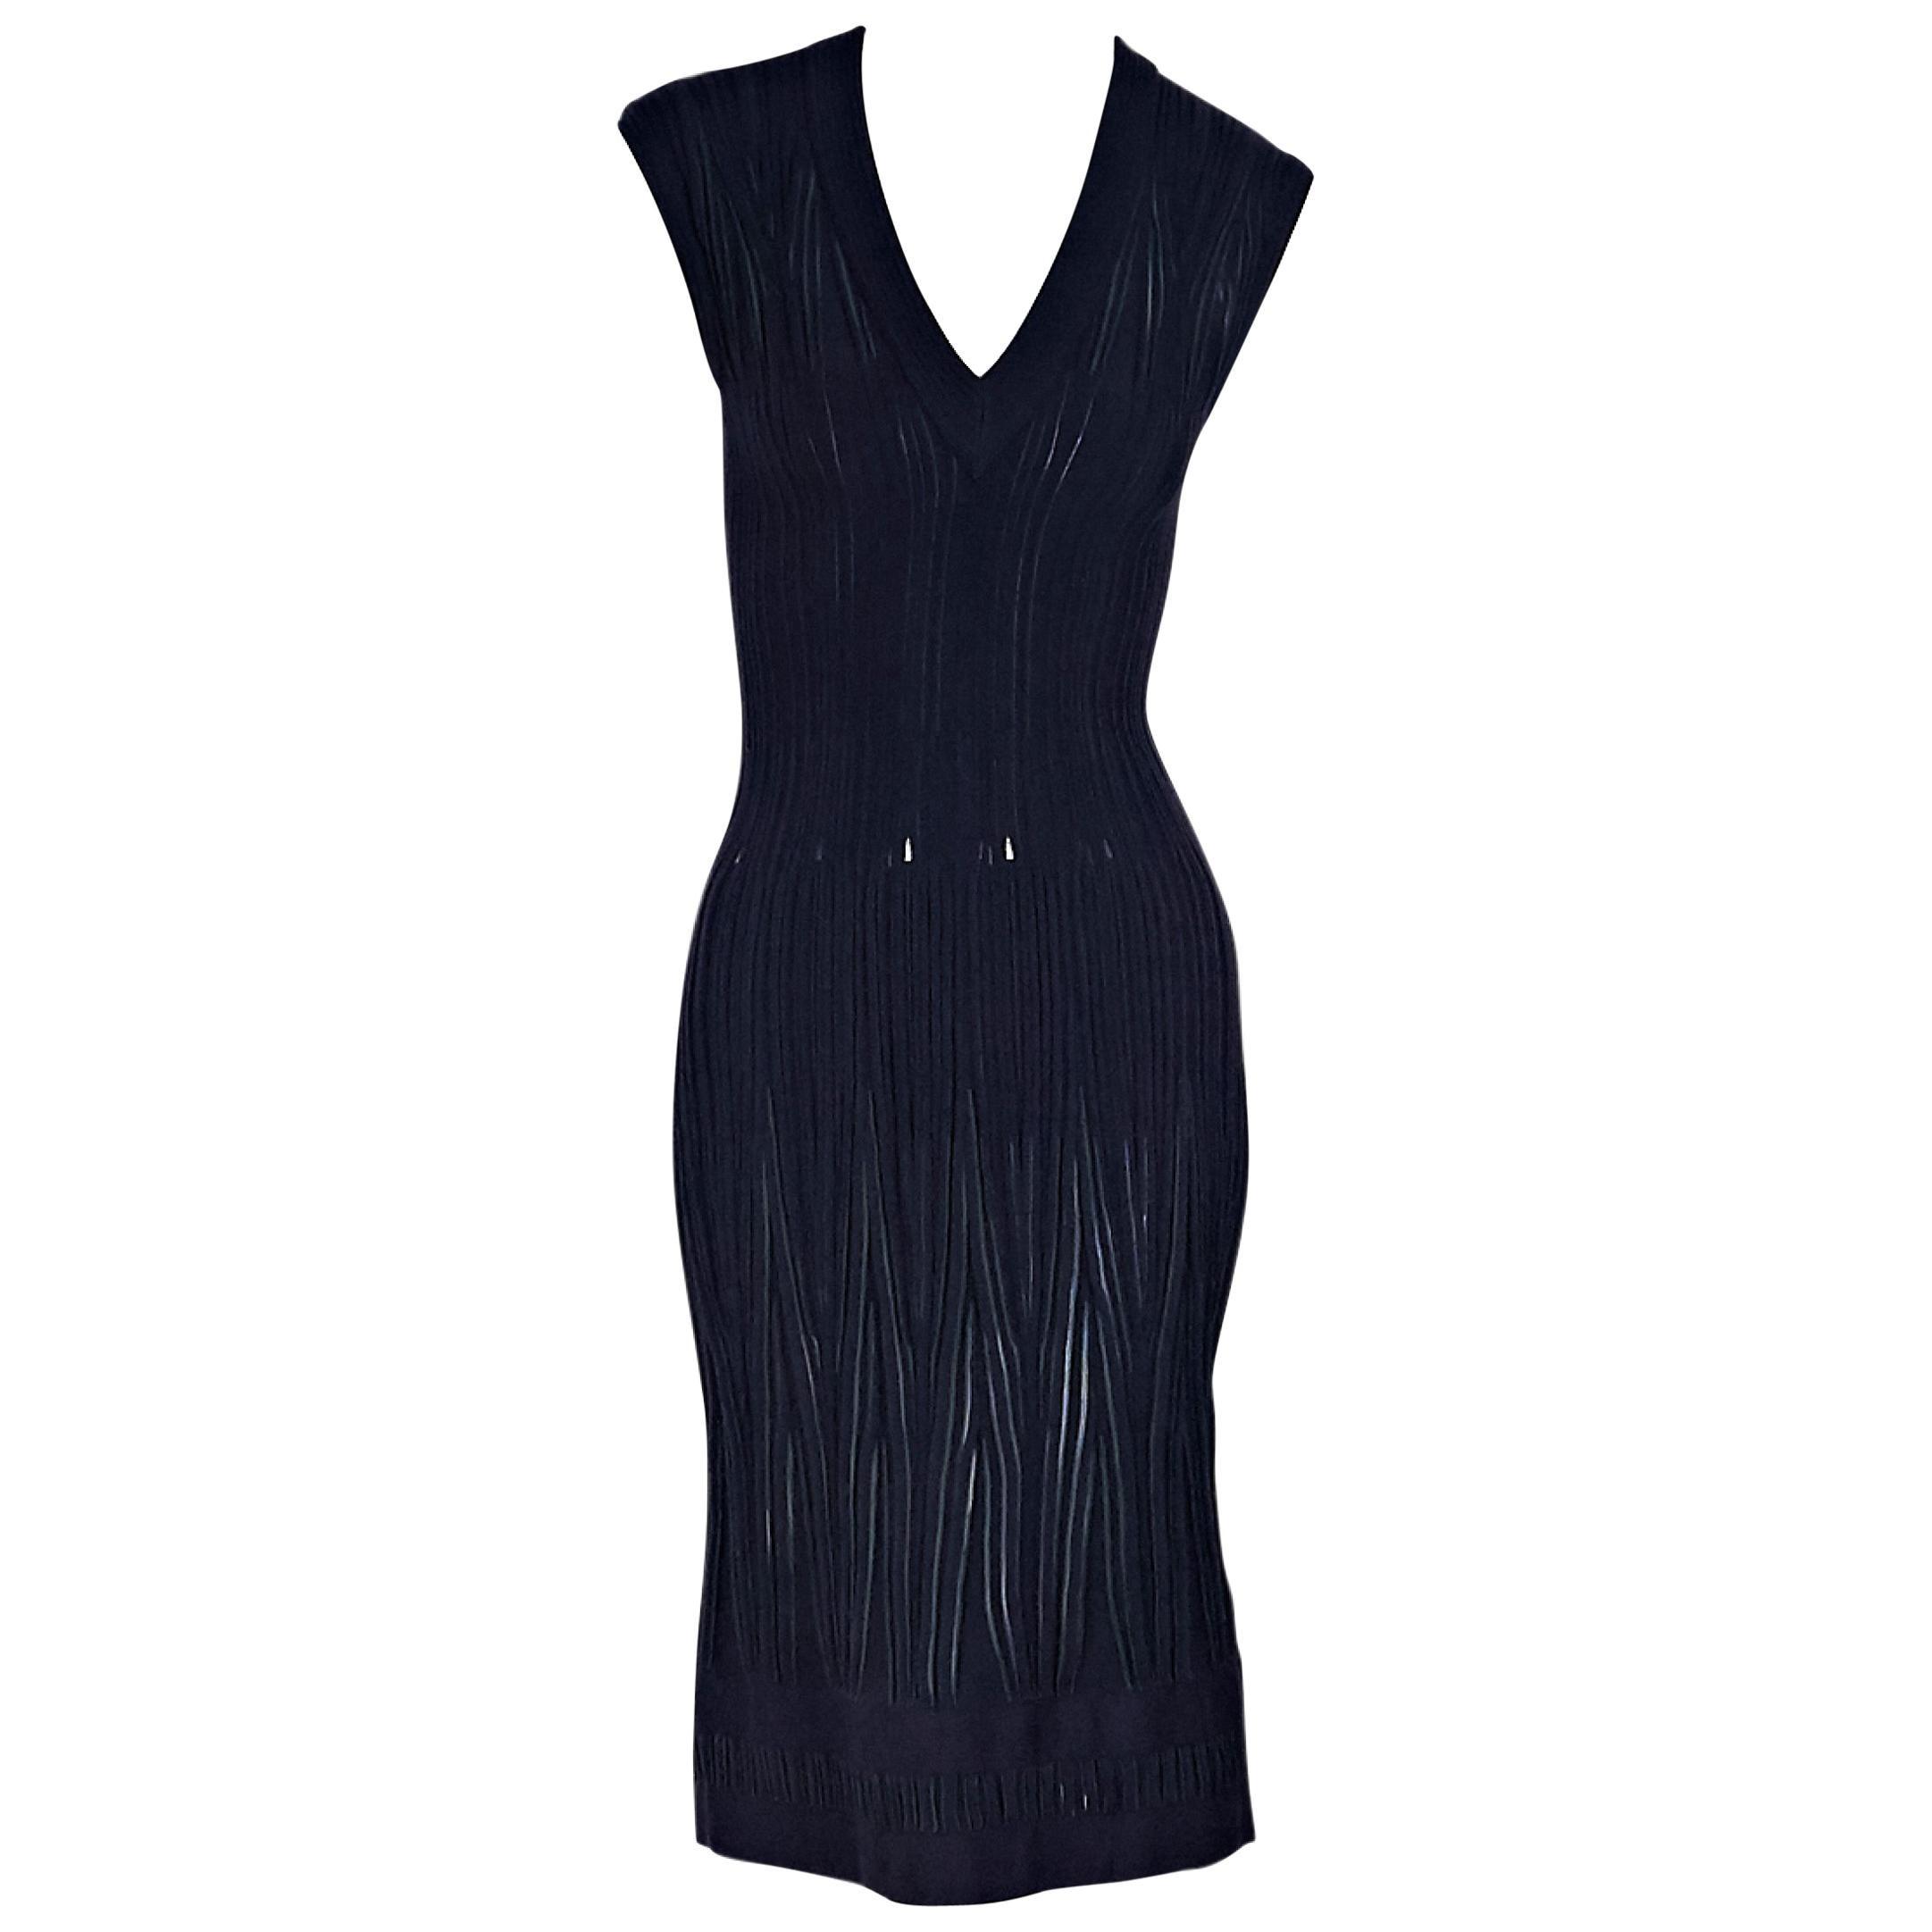 9a2e8344 Alaia Blue and Green Knit Sheath Dress at 1stdibs